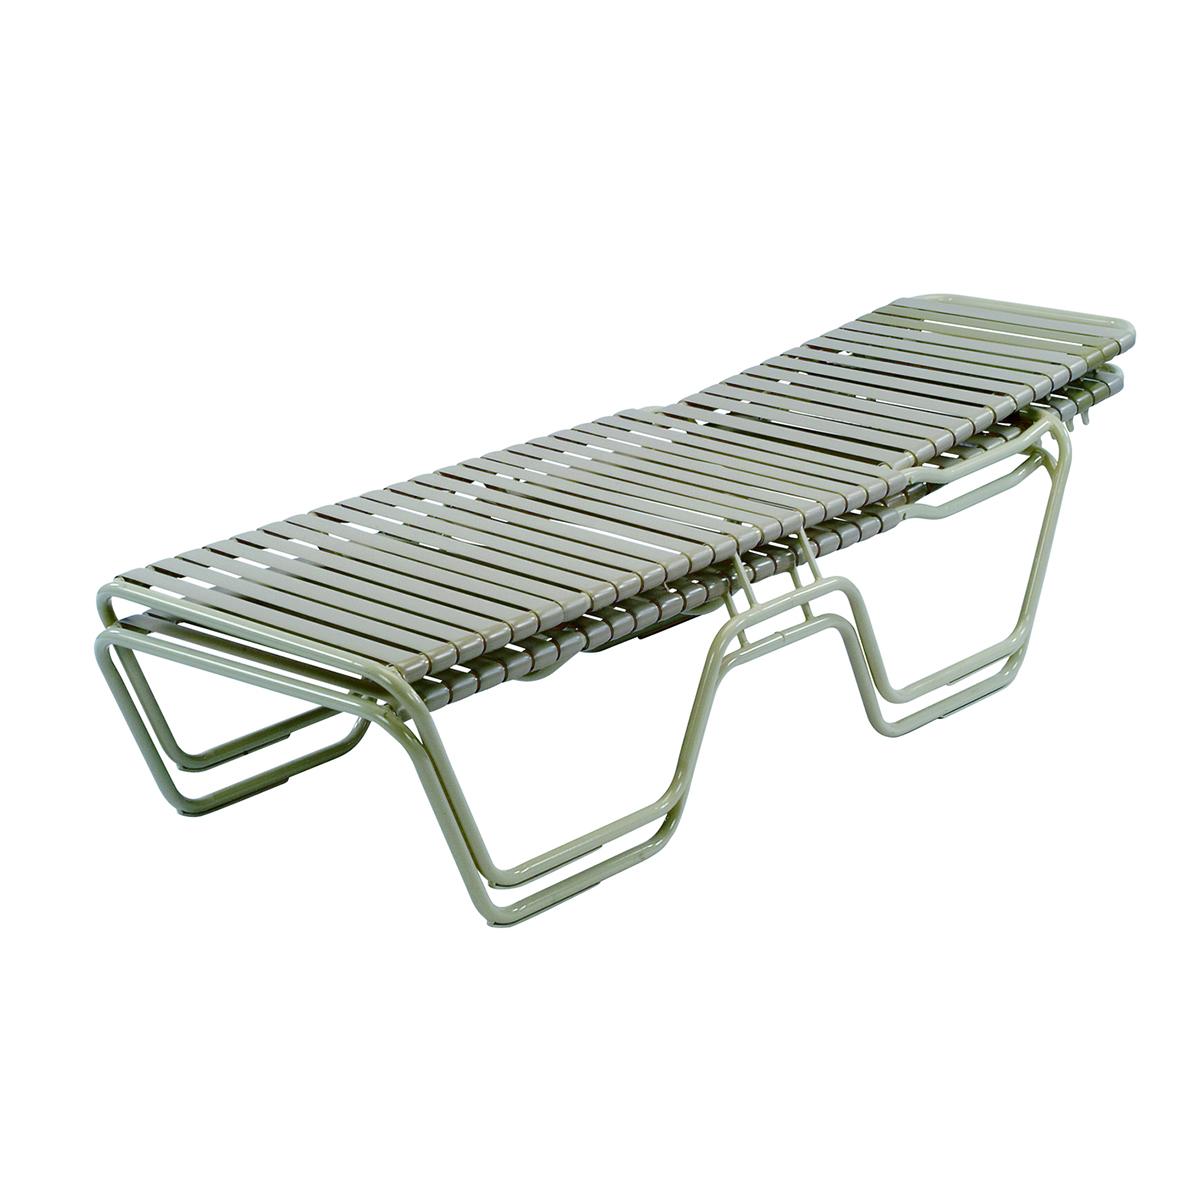 14 5 in seat country club aluminum vinyl strap chaise for Aluminum strap chaise lounge